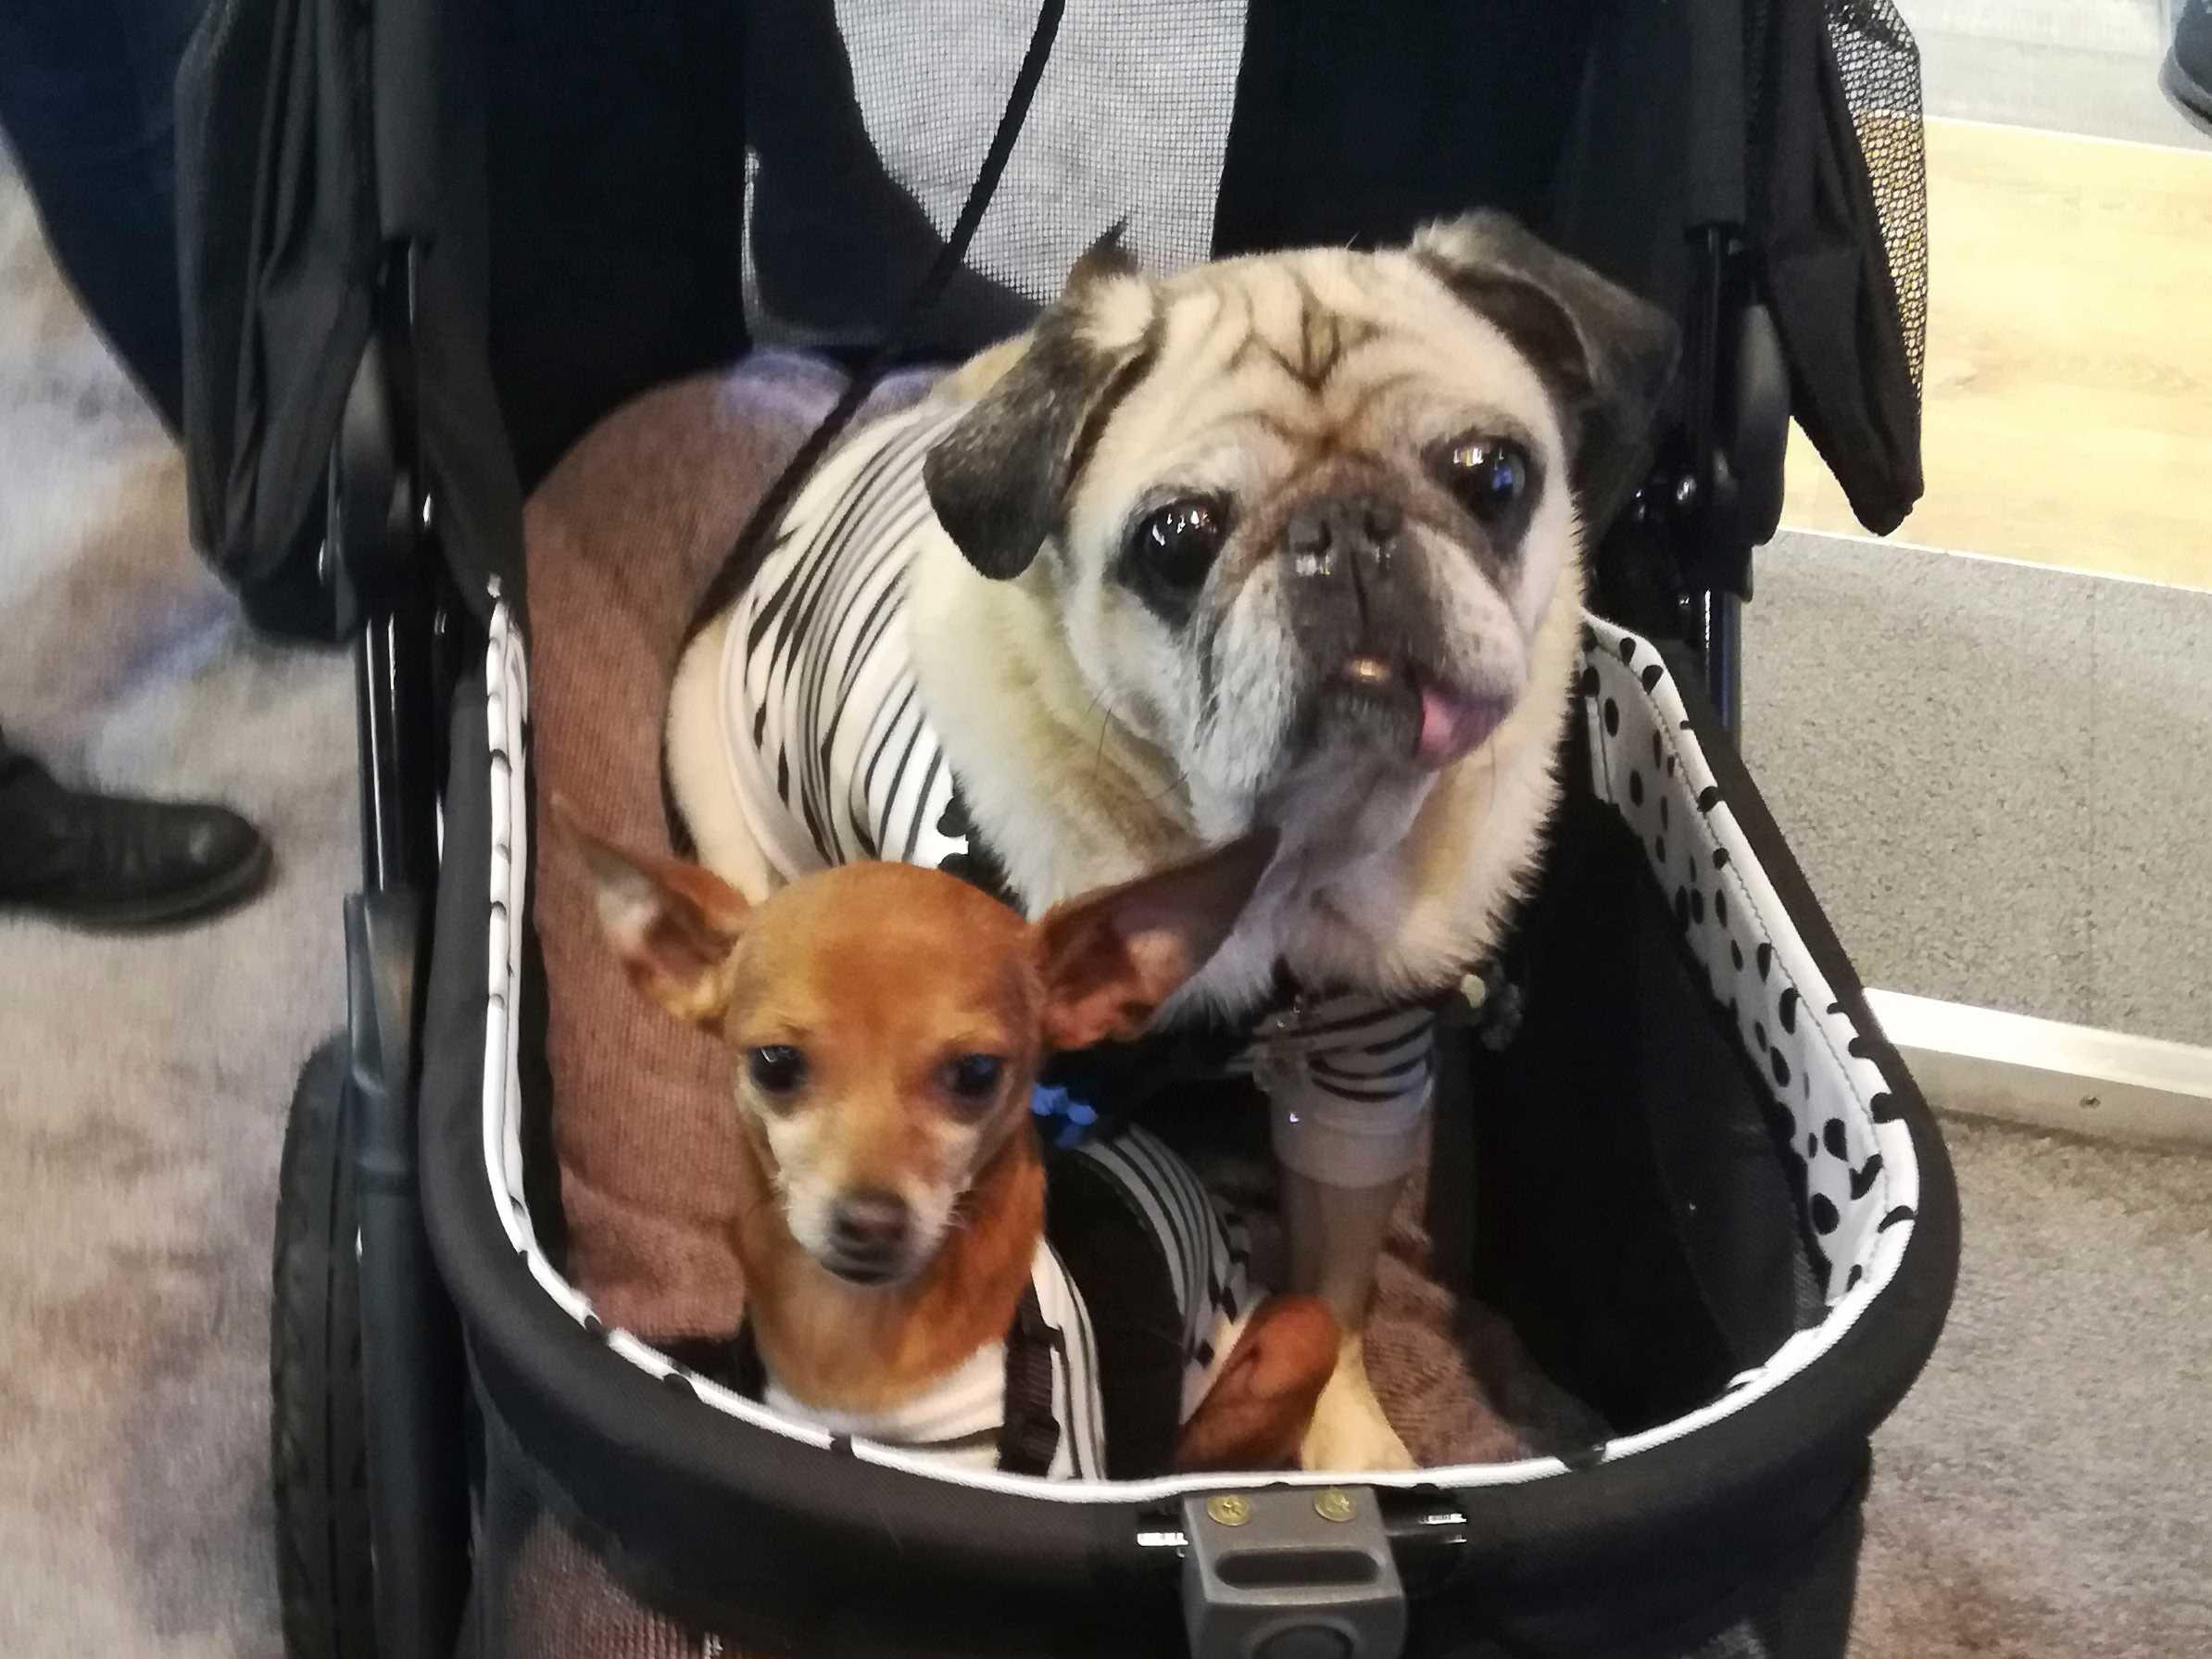 Pet Lovers Meet Pet Stars at Manhattan's PetCon